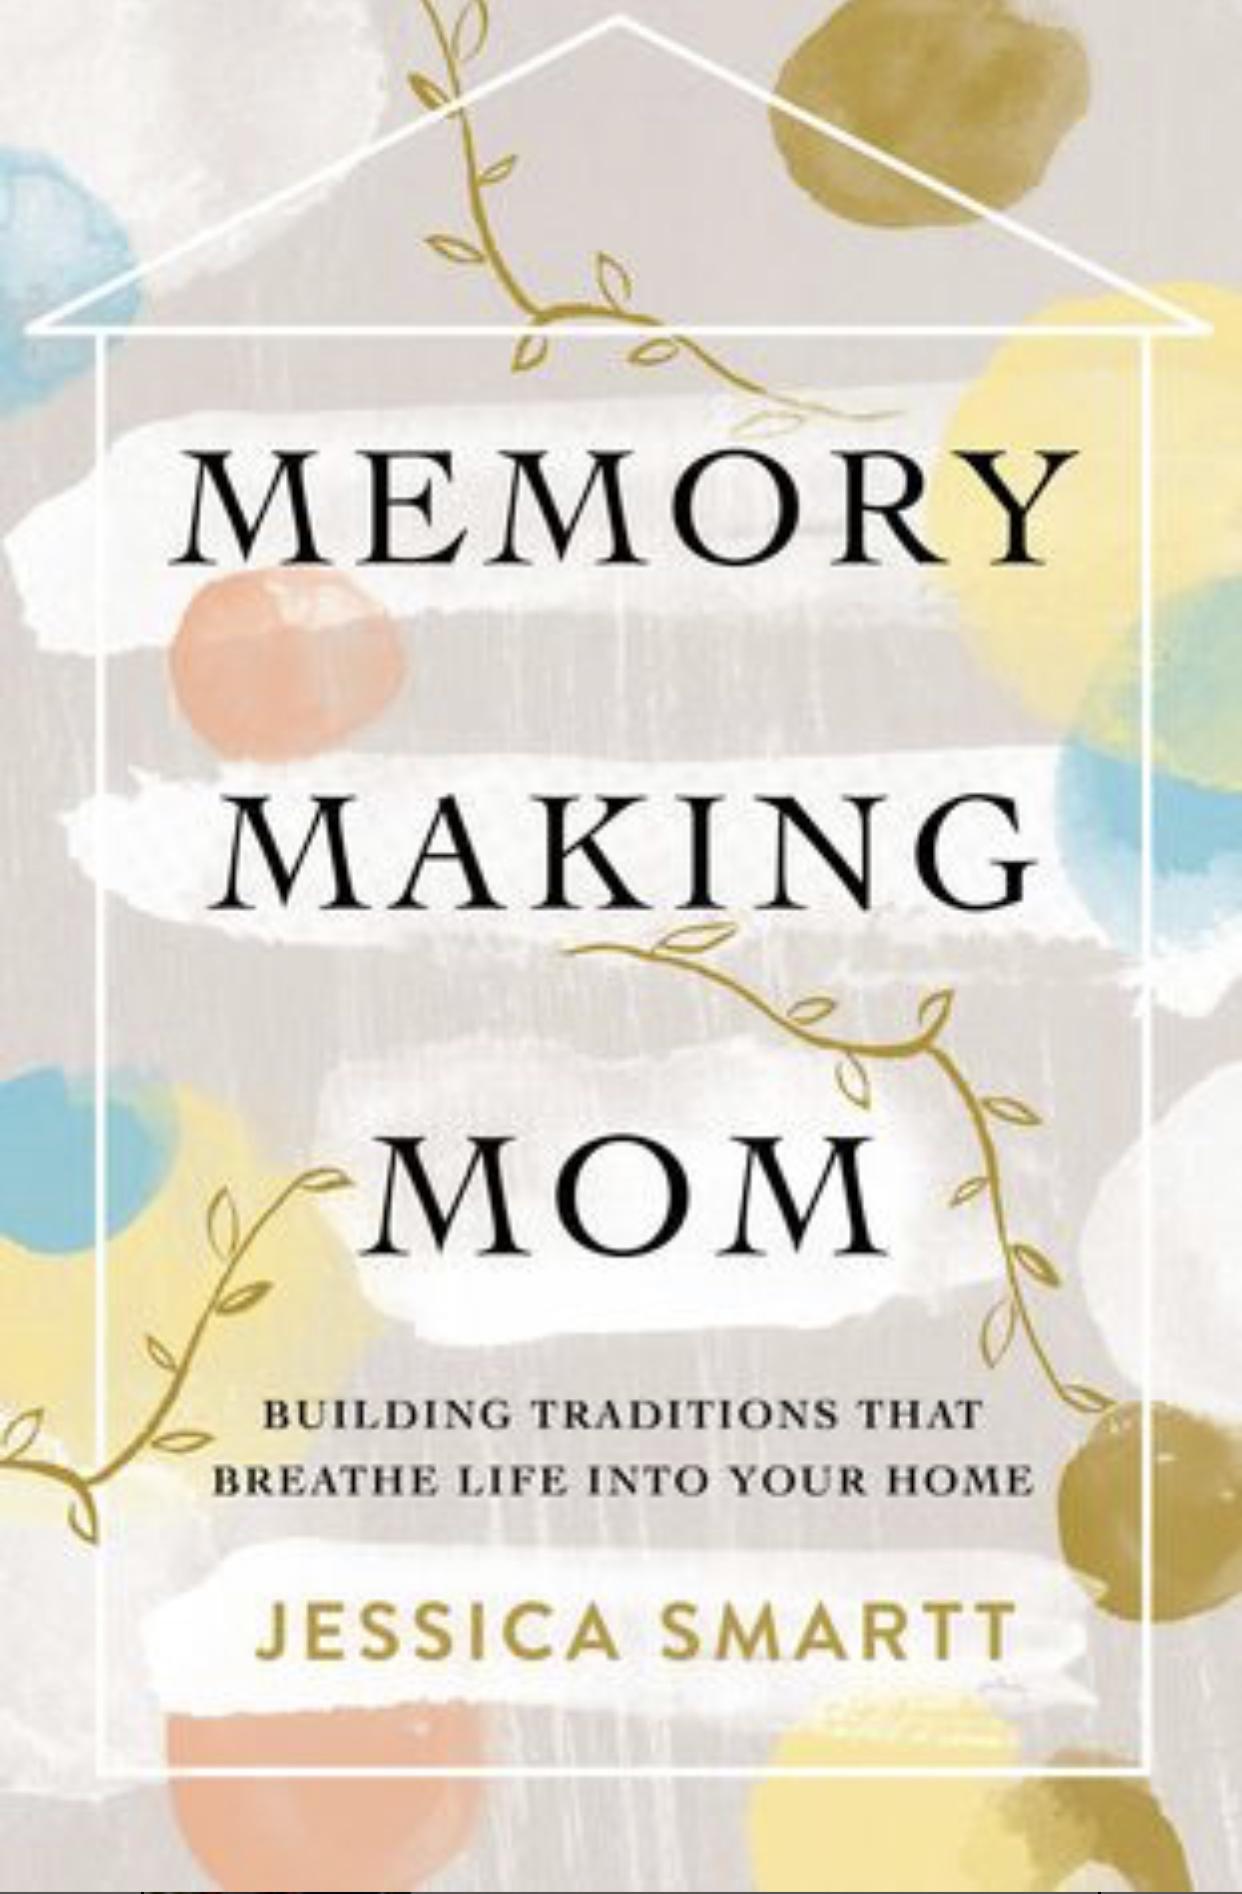 memory making mom.jpg